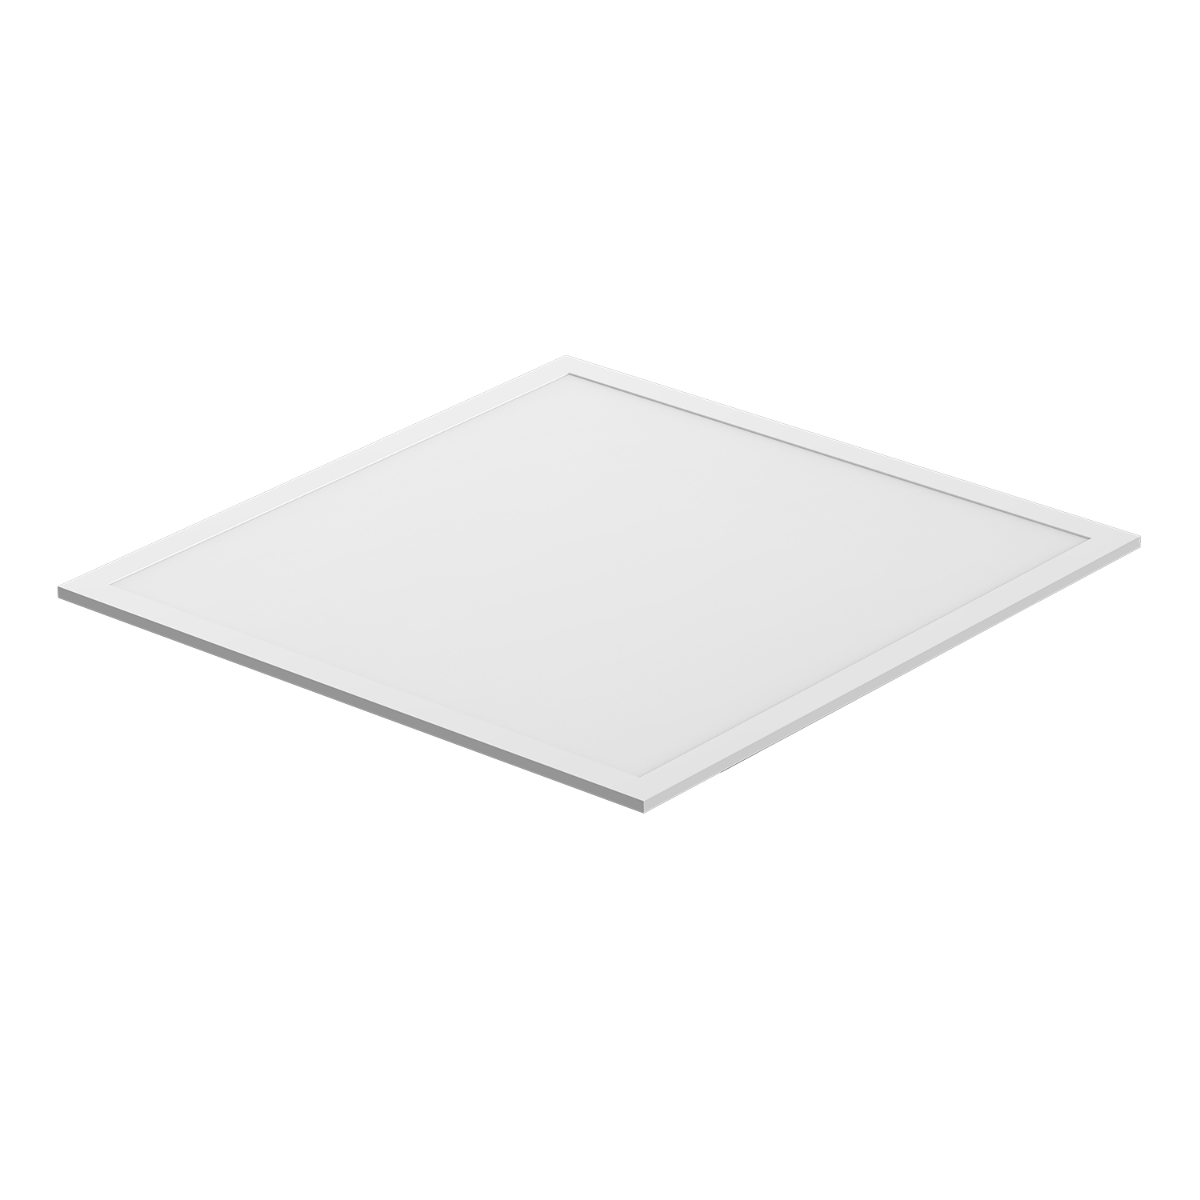 Noxion LED Panel Econox 32W Xitanium DALI 60x60cm 3000K 3900lm UGR <22 | Dali Dimbar - Varm Vit - Ersättare 4x18W